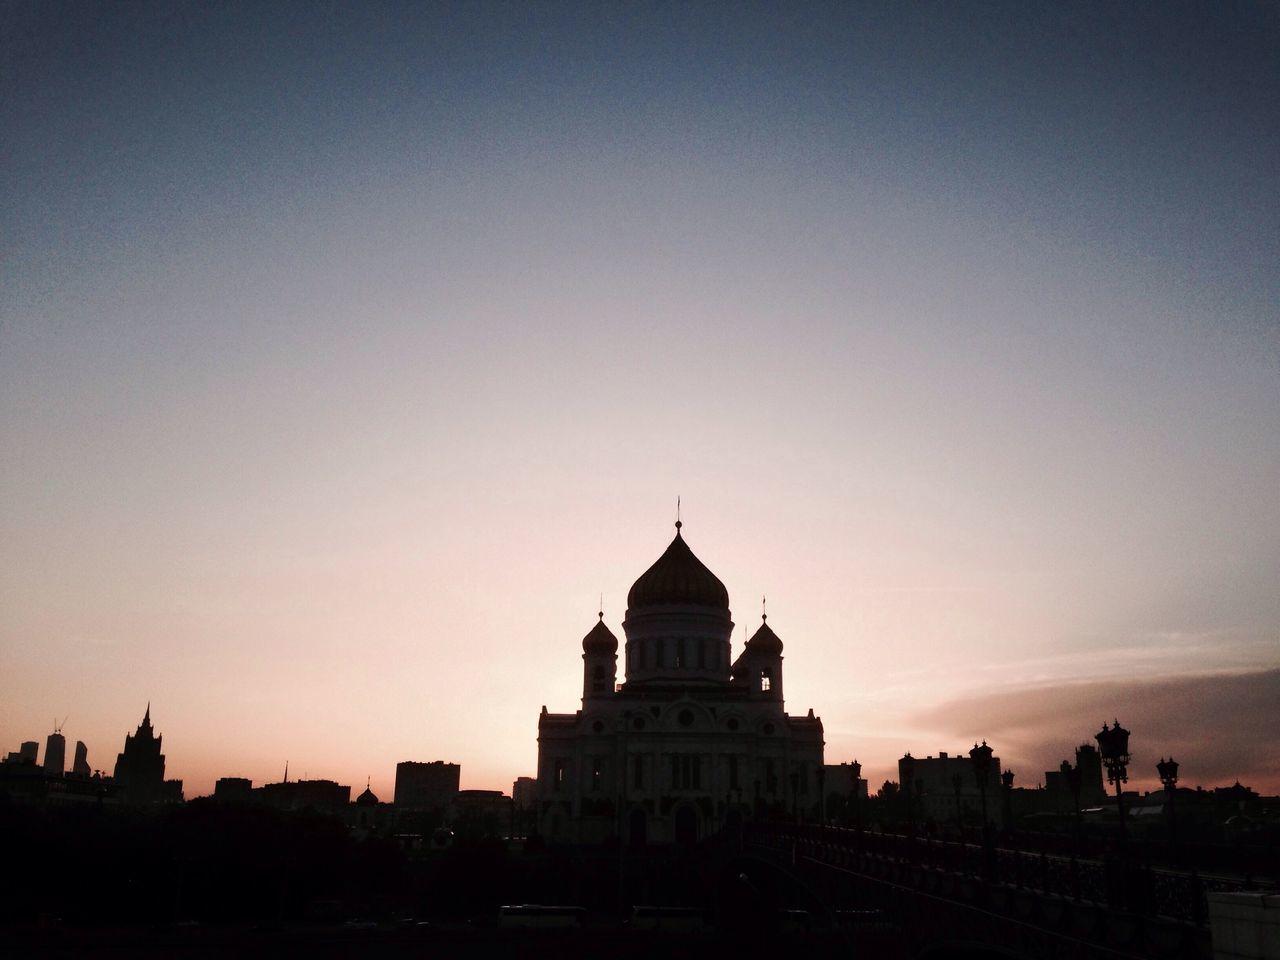 Church Moscow Russia Sky Sunset Q Eyeemphoto